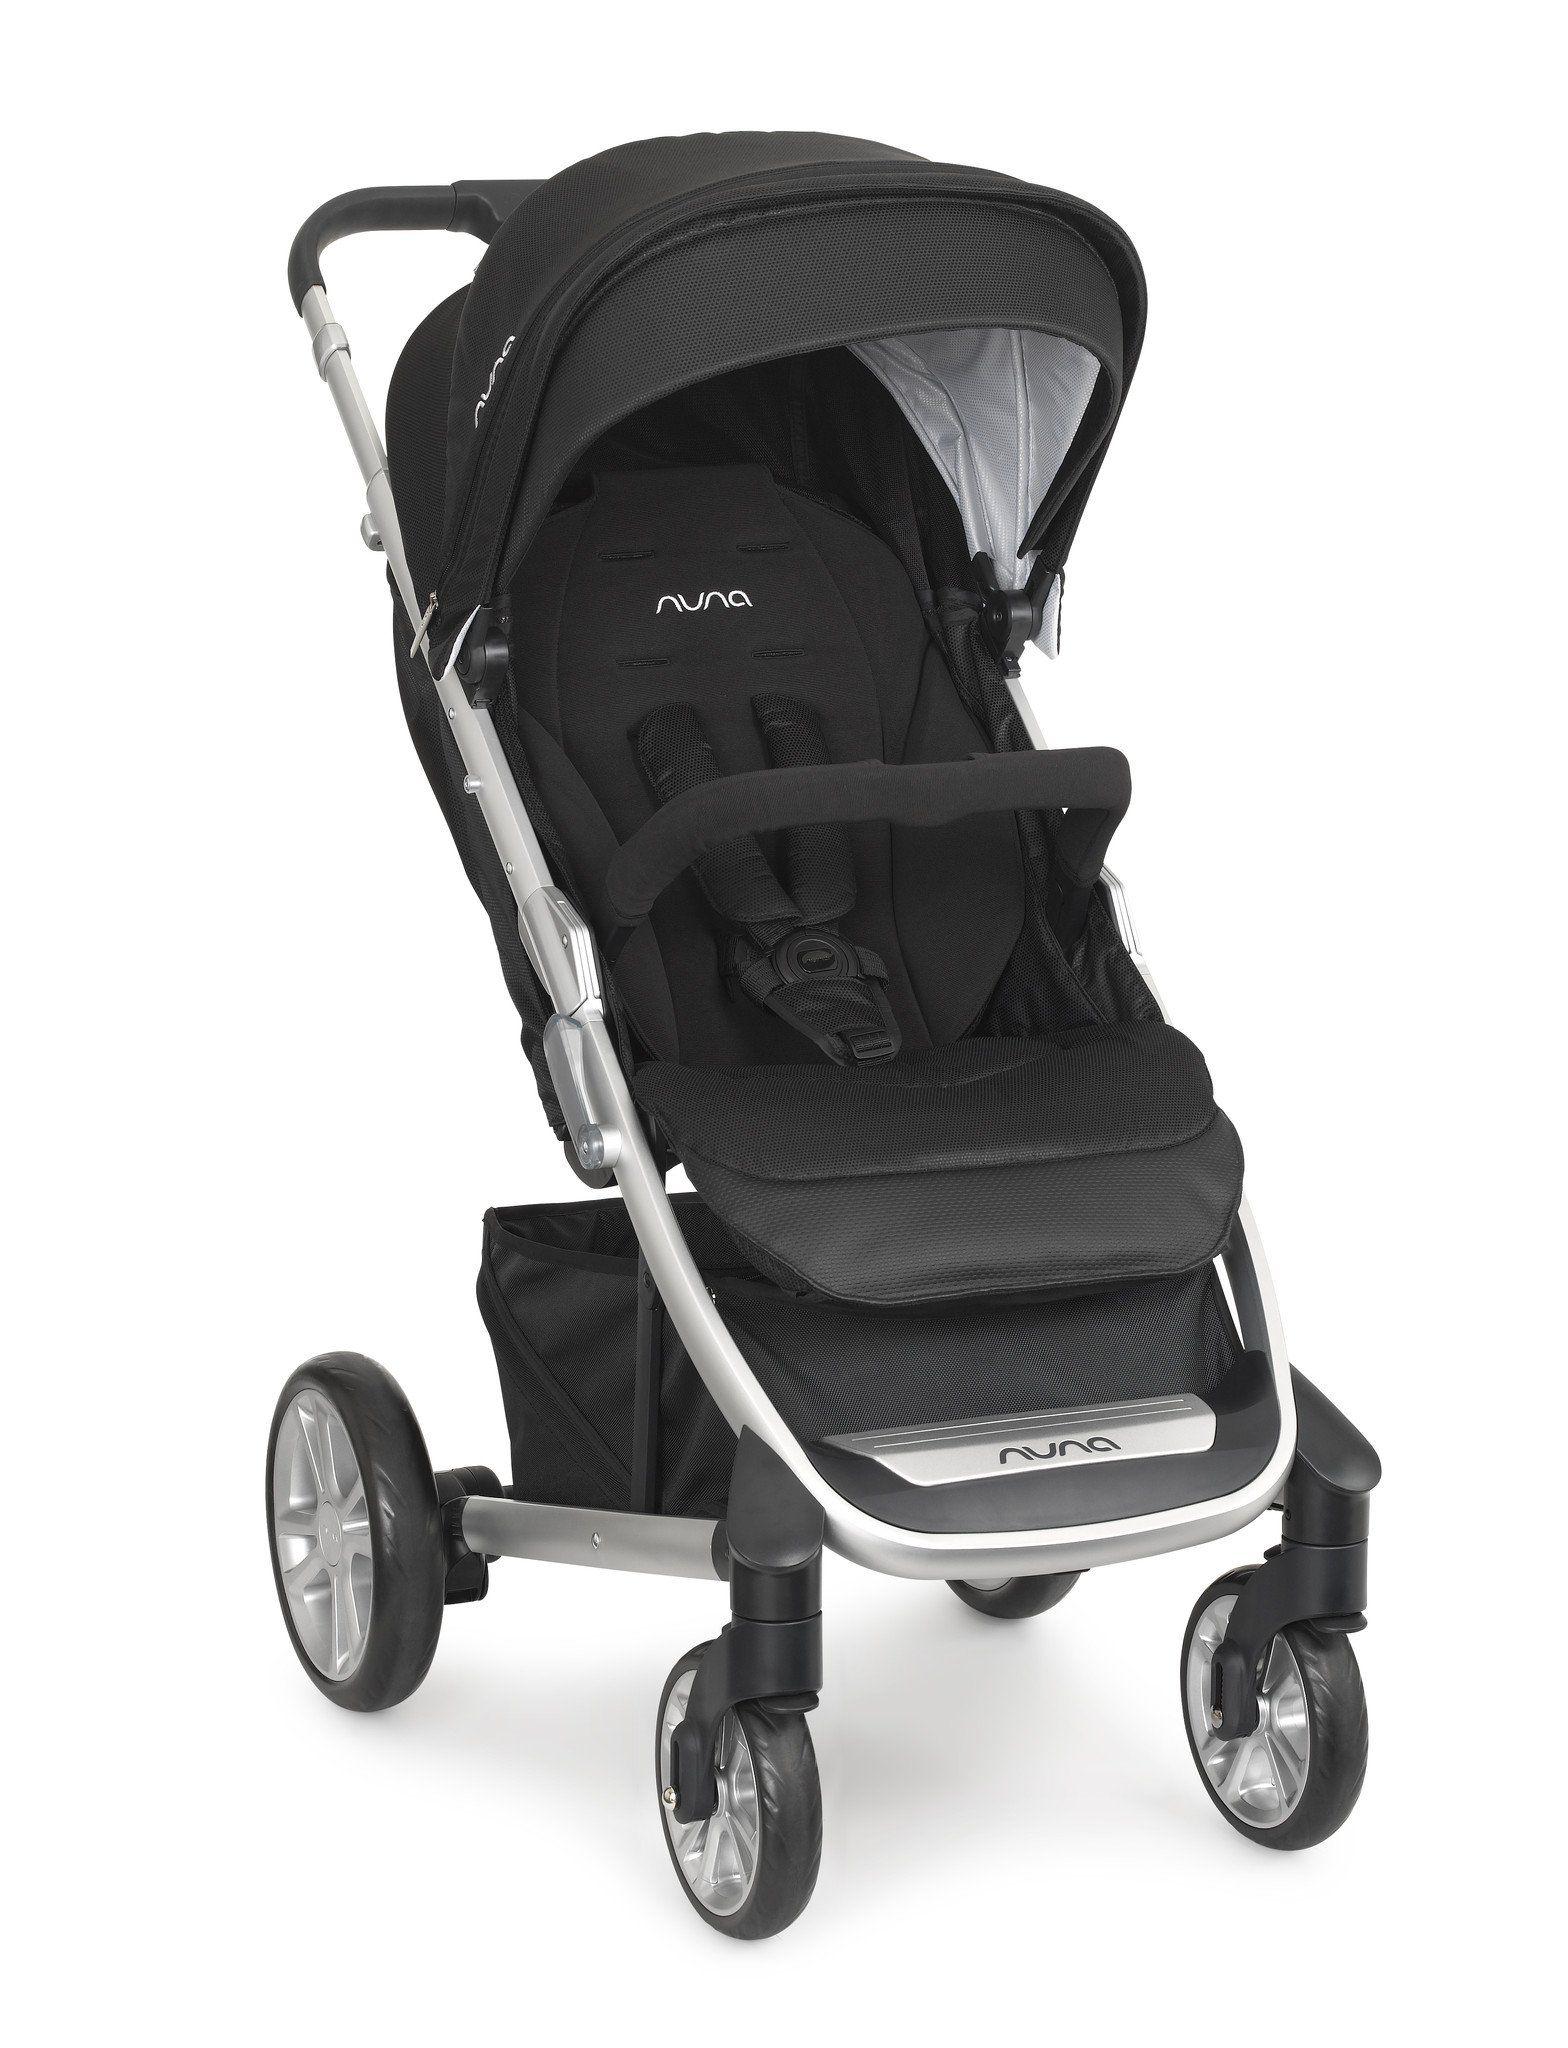 Nuna TAVO Sporty Stroller Baby strollers, Car seats